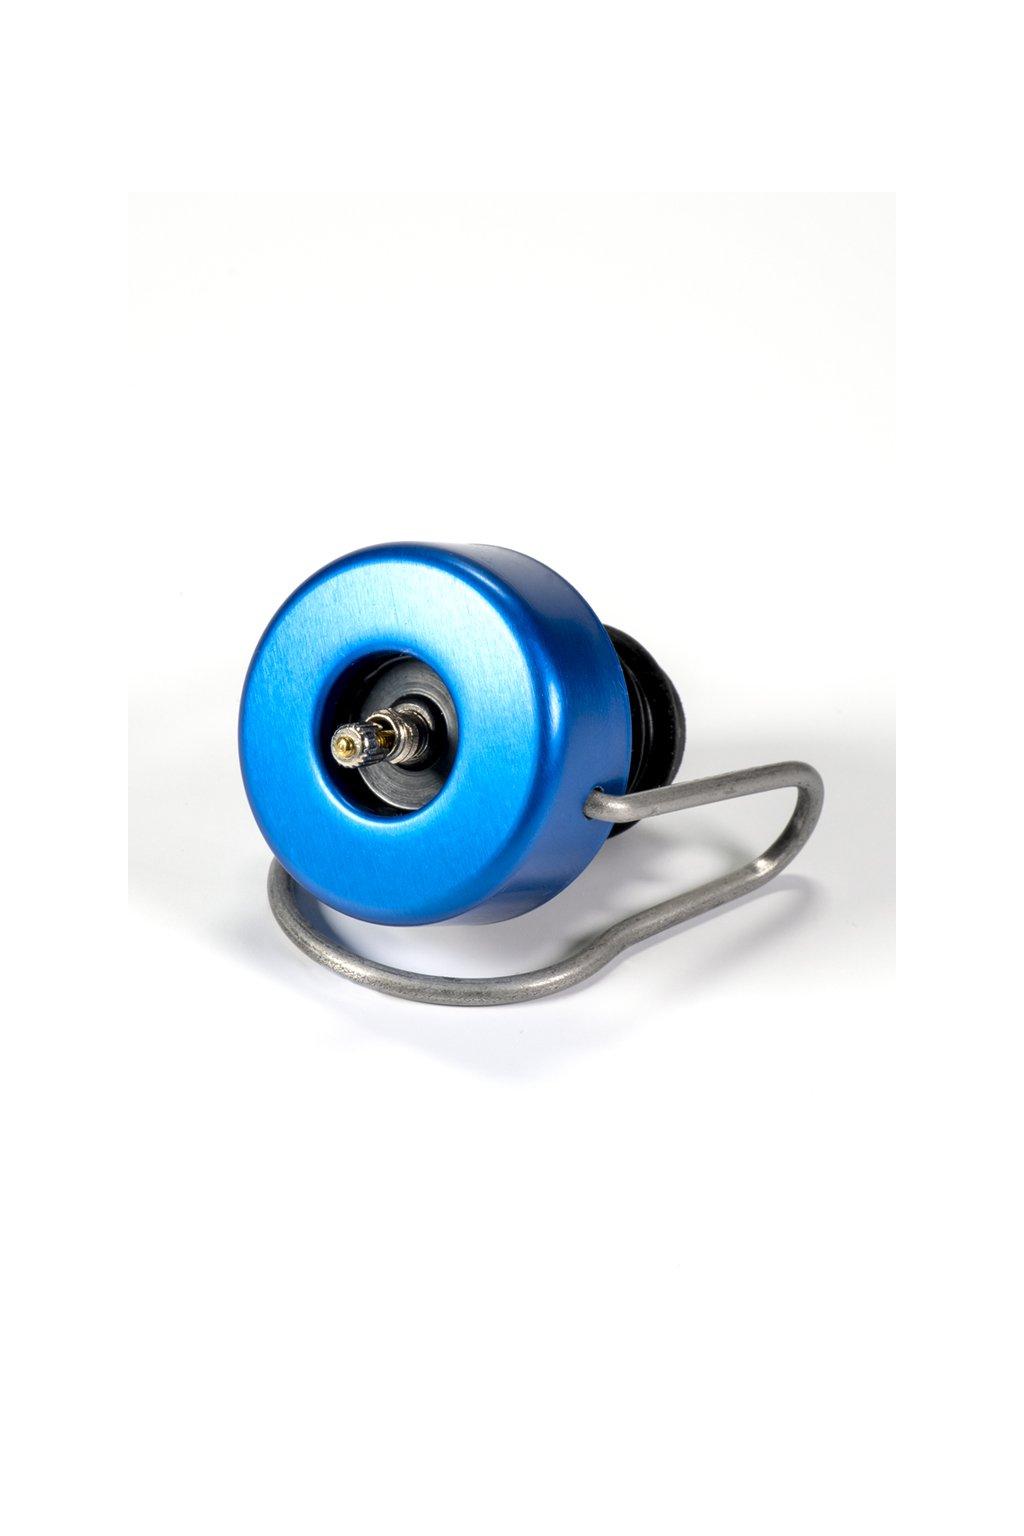 Zátka modrá lesklá